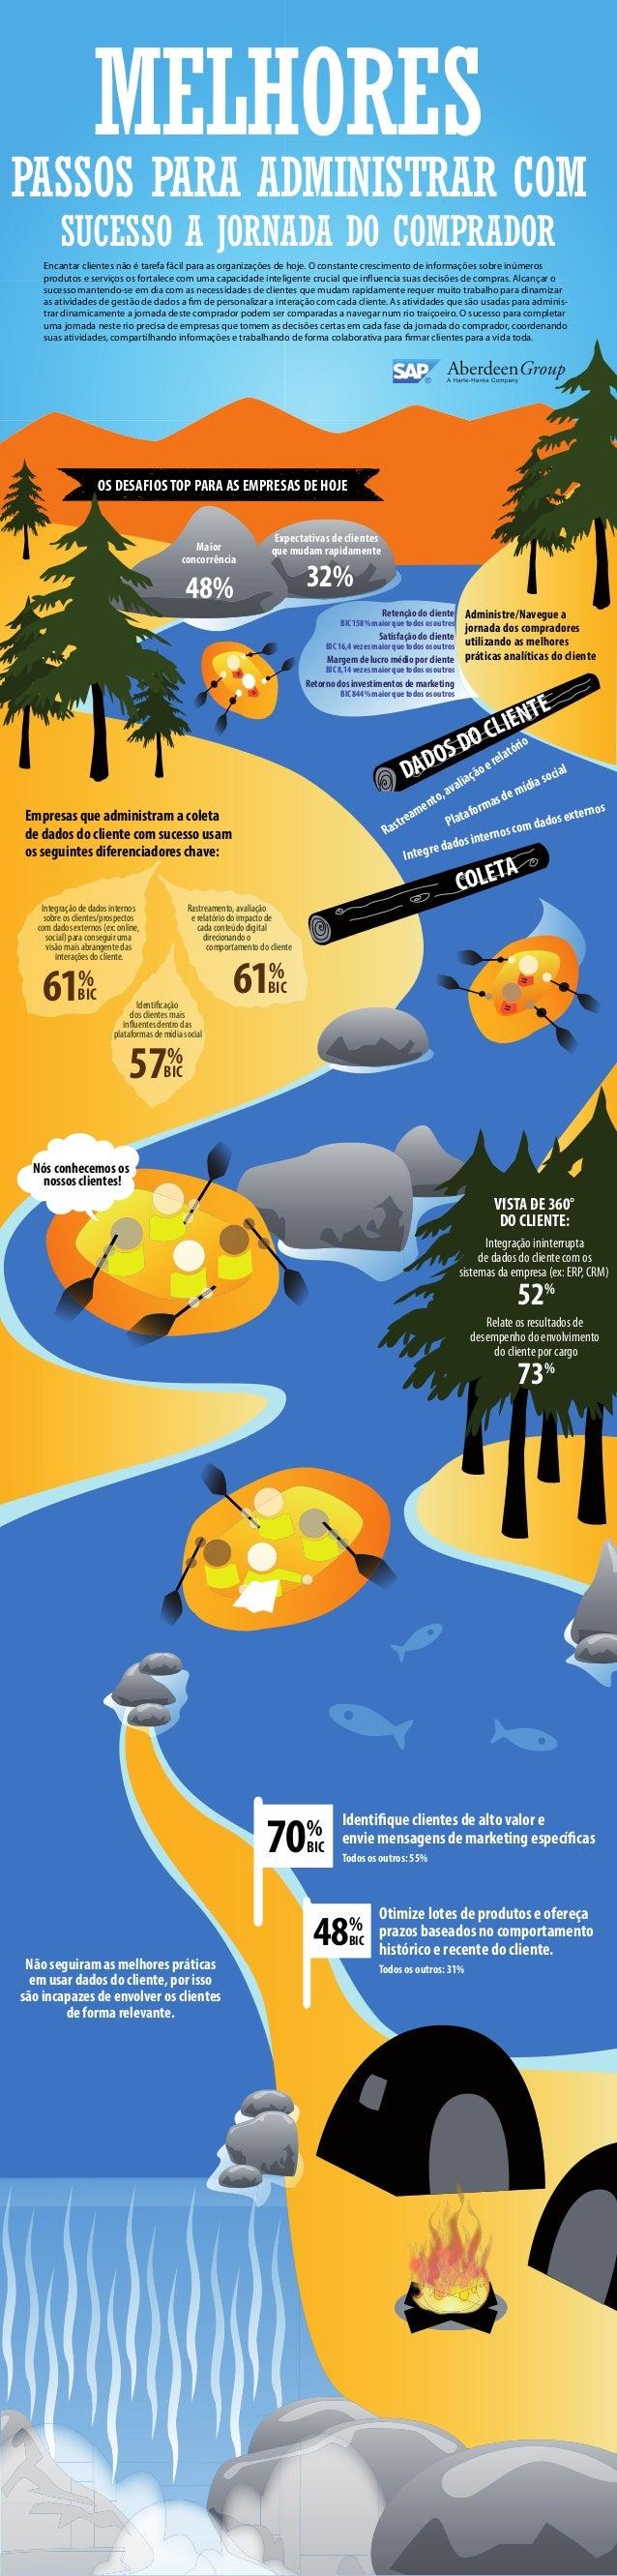 Customer Analytics Infographic (Brazilian Portuguese)